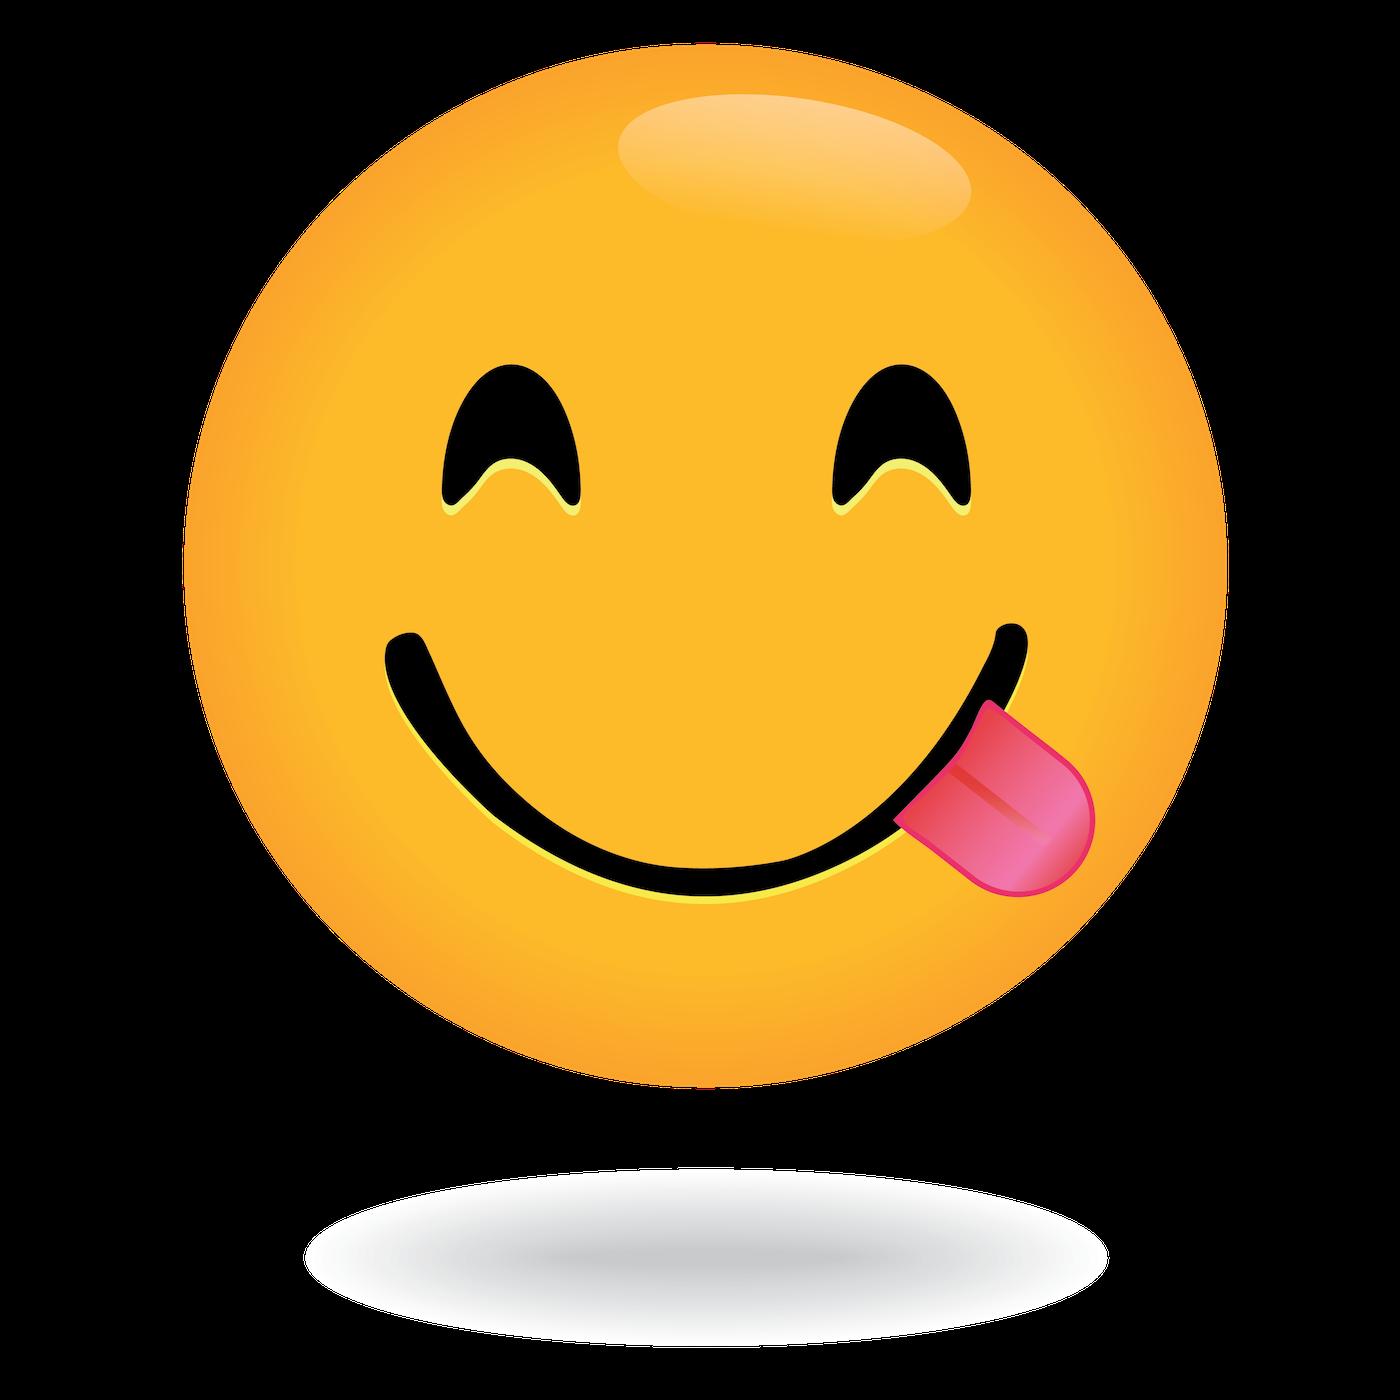 Define Awesome Tongue Emoji Face